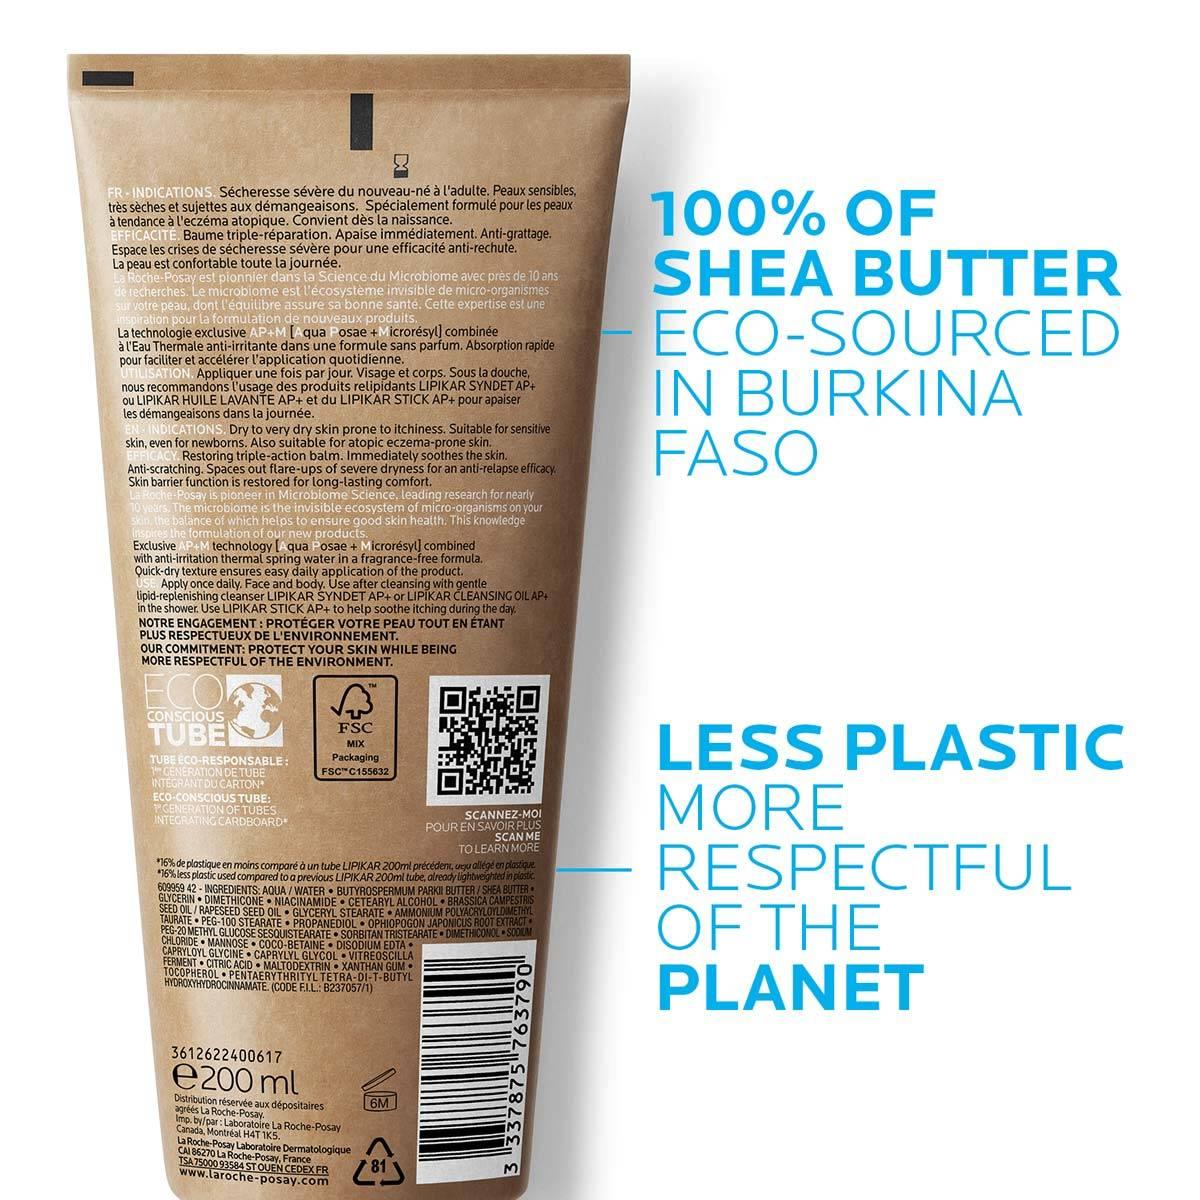 La Roche Posay Eczema Lipikar Baume AP Plus M Eco Conscious Back e-retail